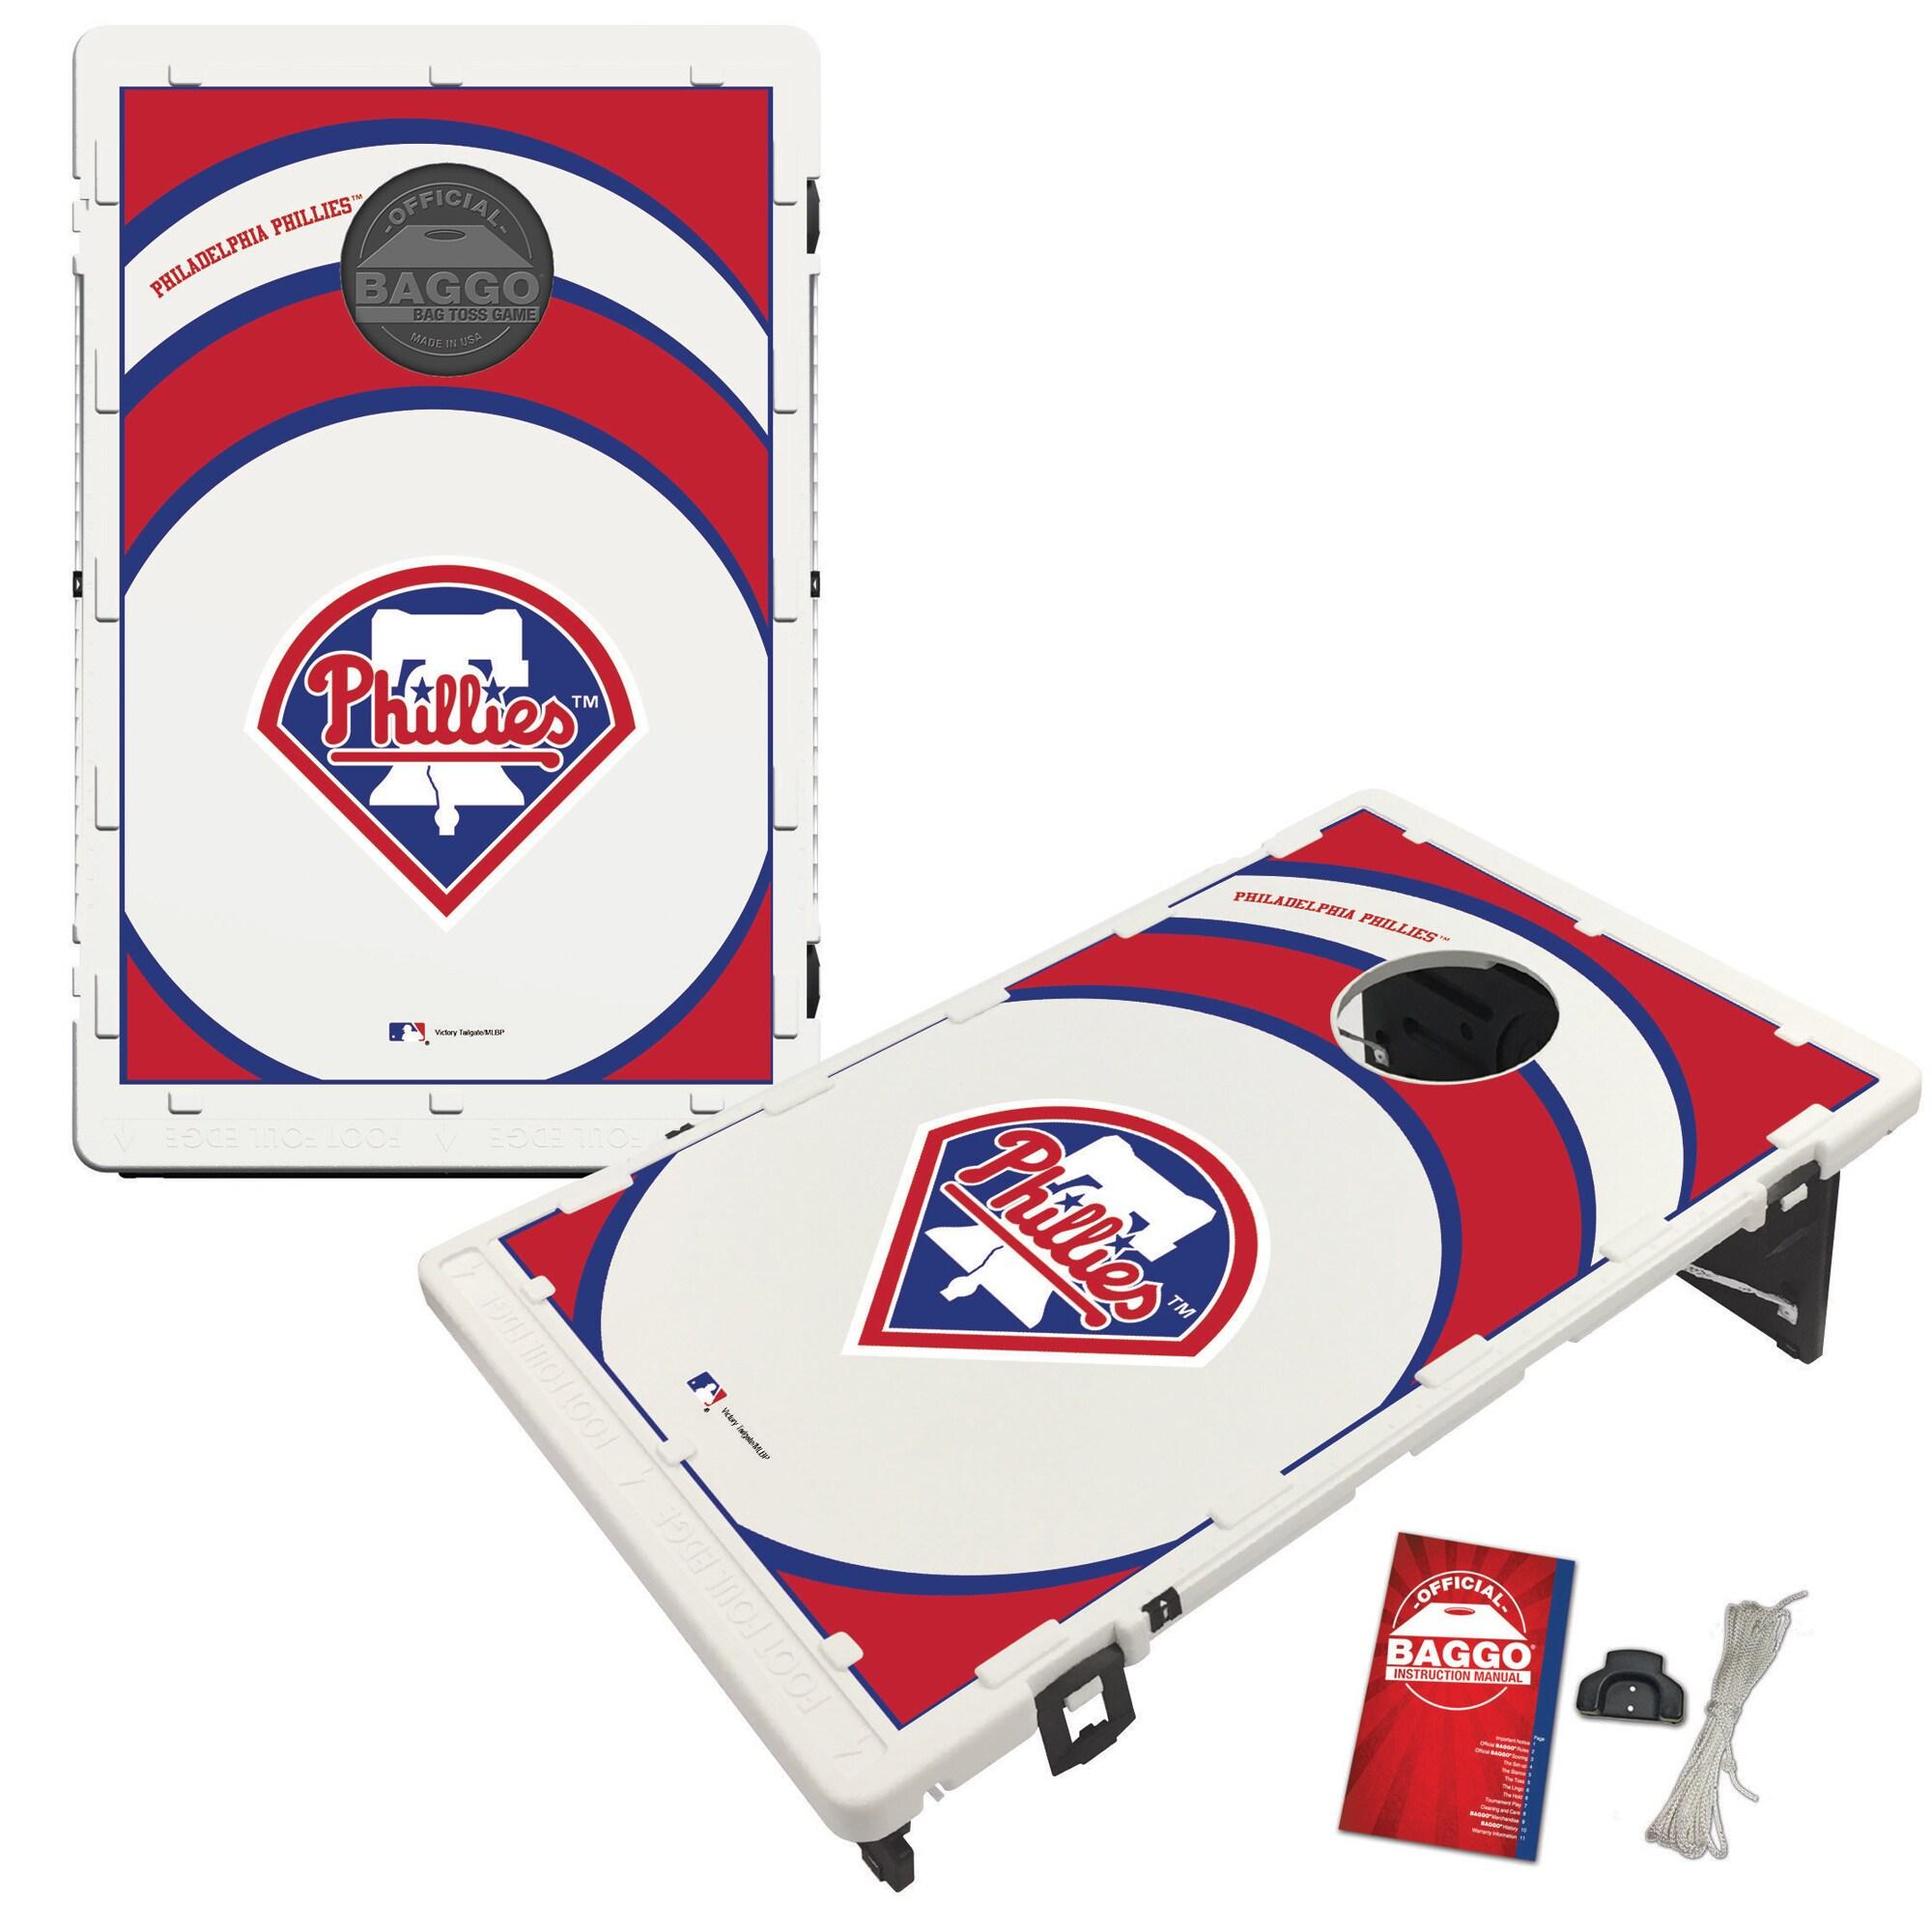 Philadelphia Phillies 2' x 3' BAGGO Vortex Cornhole Board Tailgate Toss Set